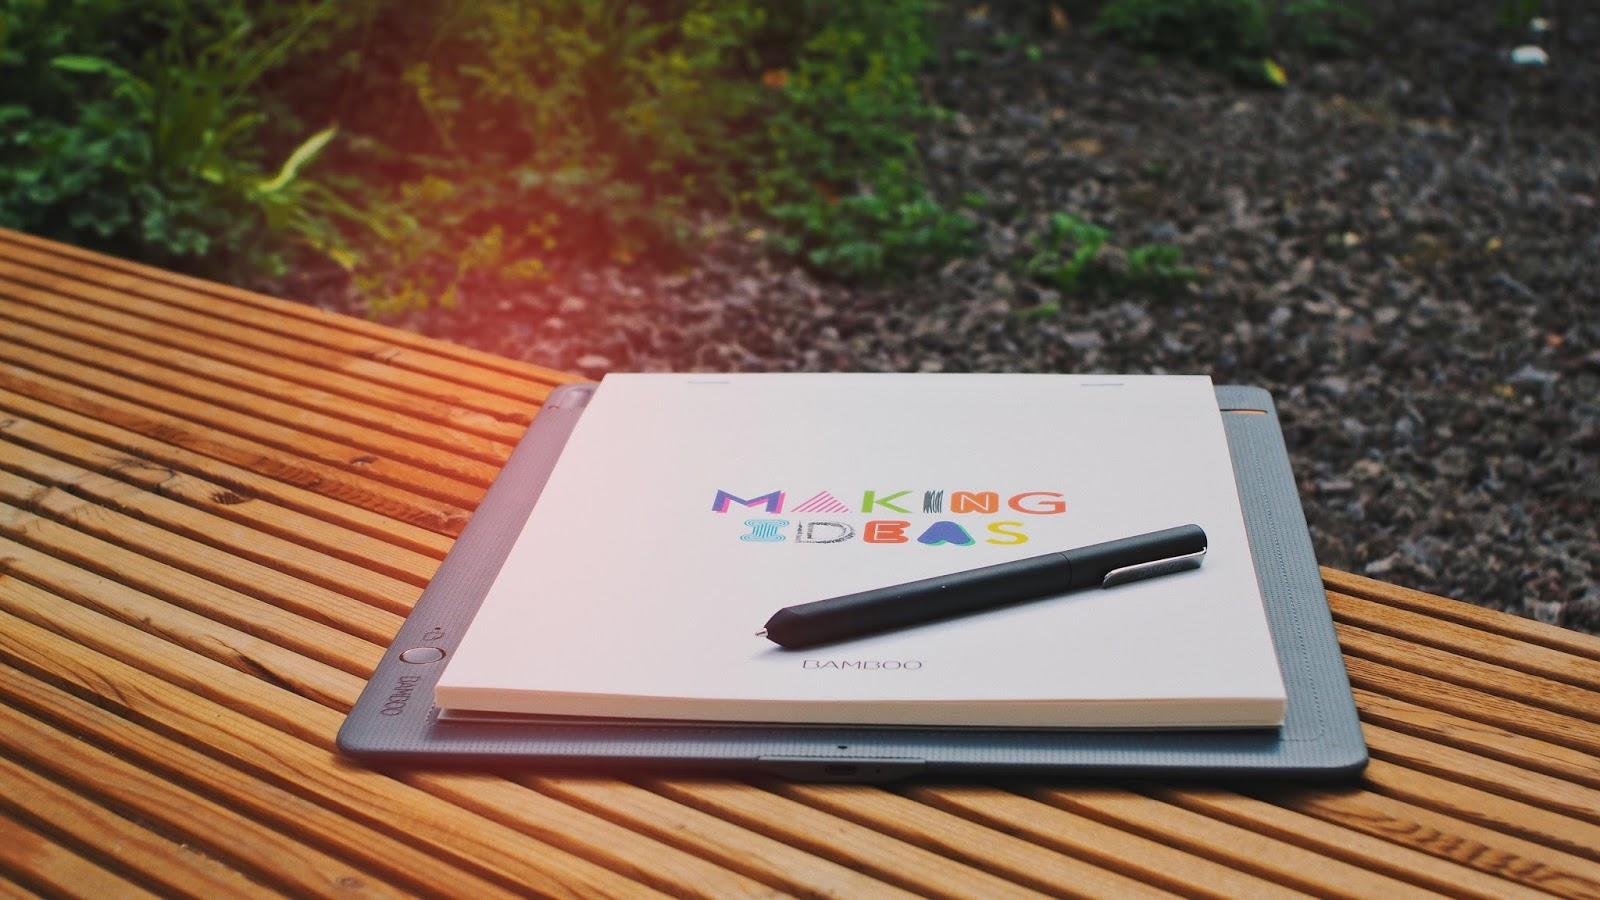 Wacom Bamboo Slate | So smart kann ein Notizblock sein